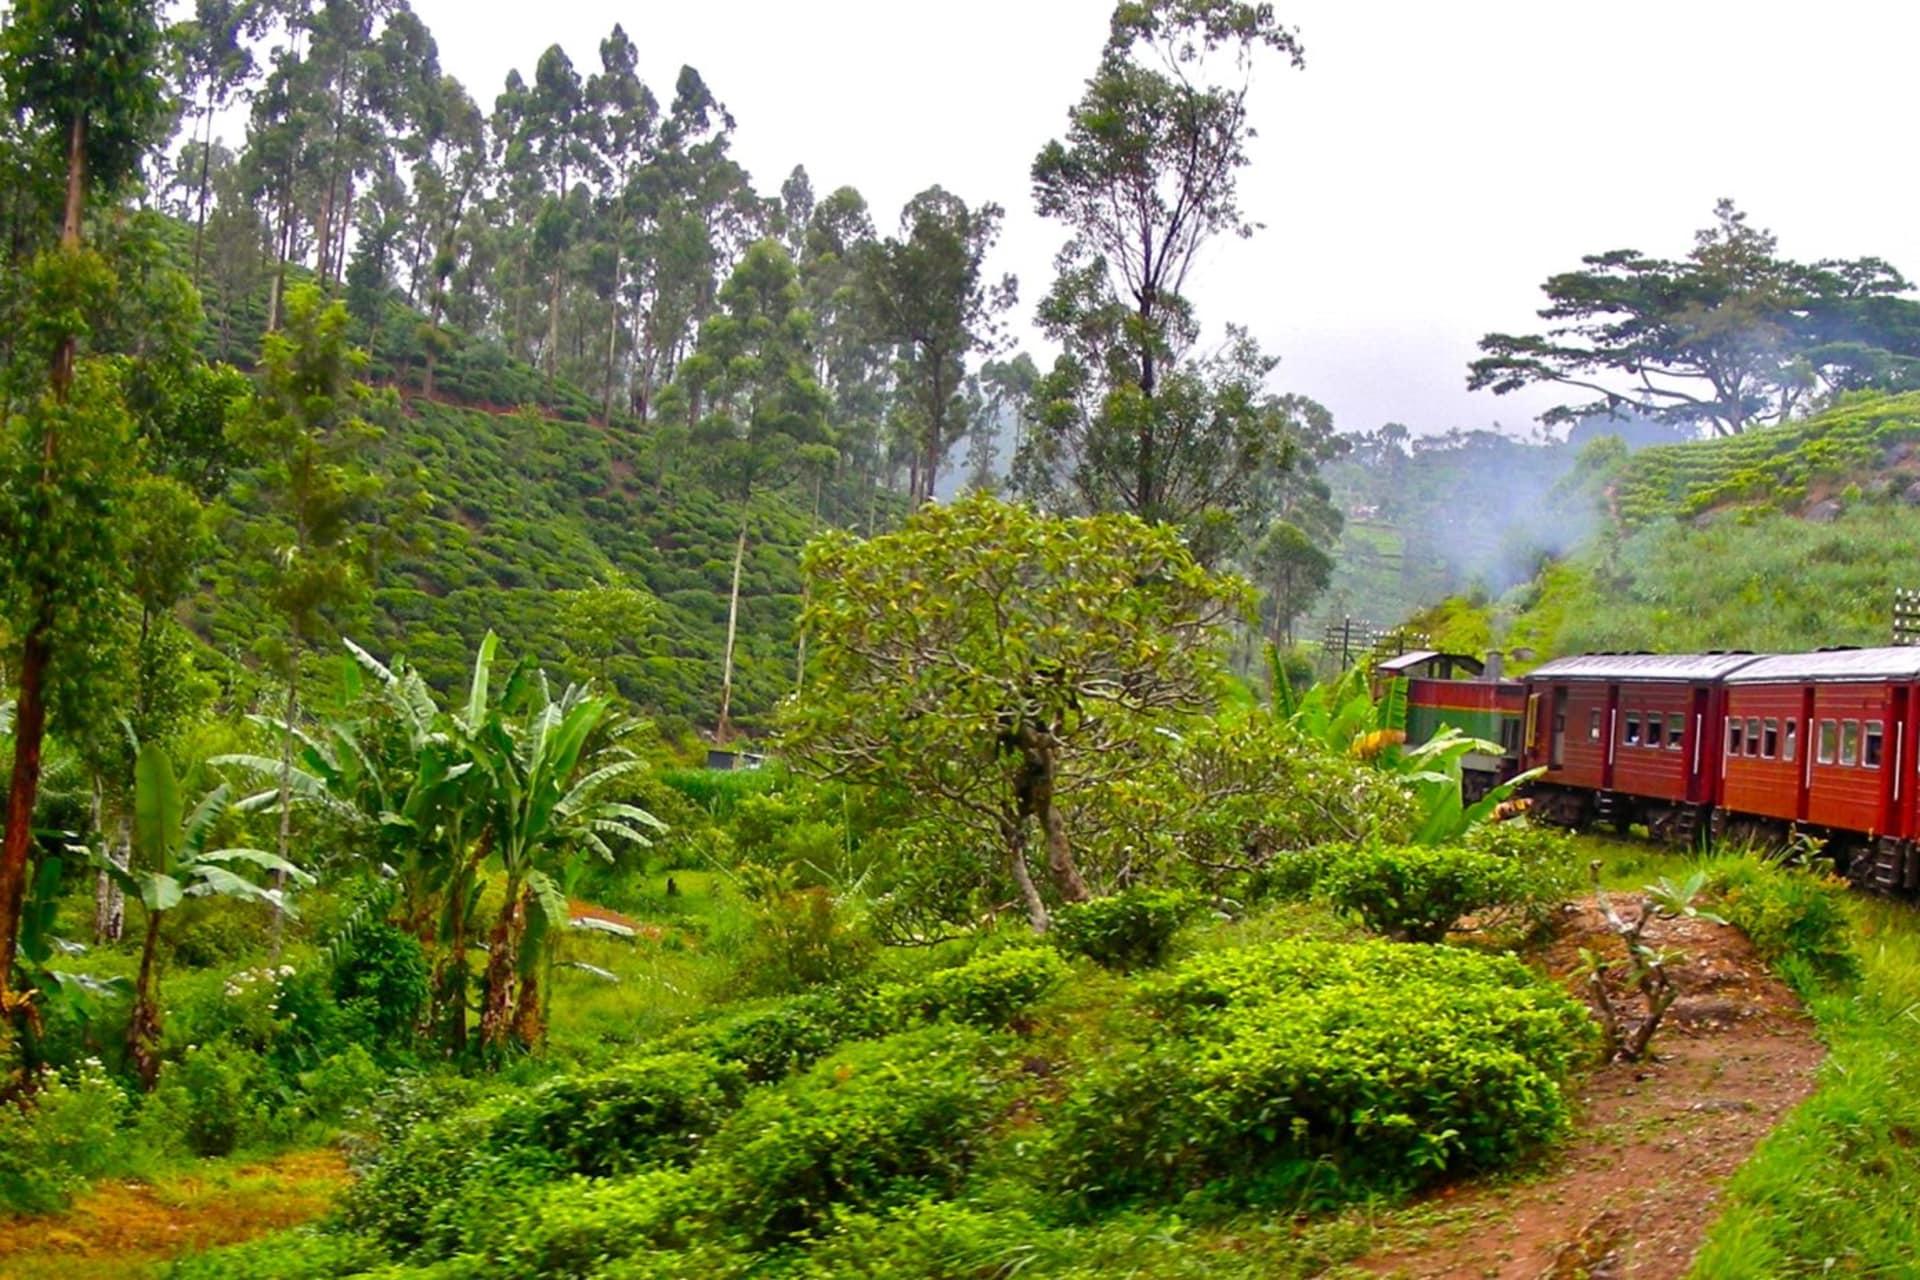 Nuwara Eliya train ride